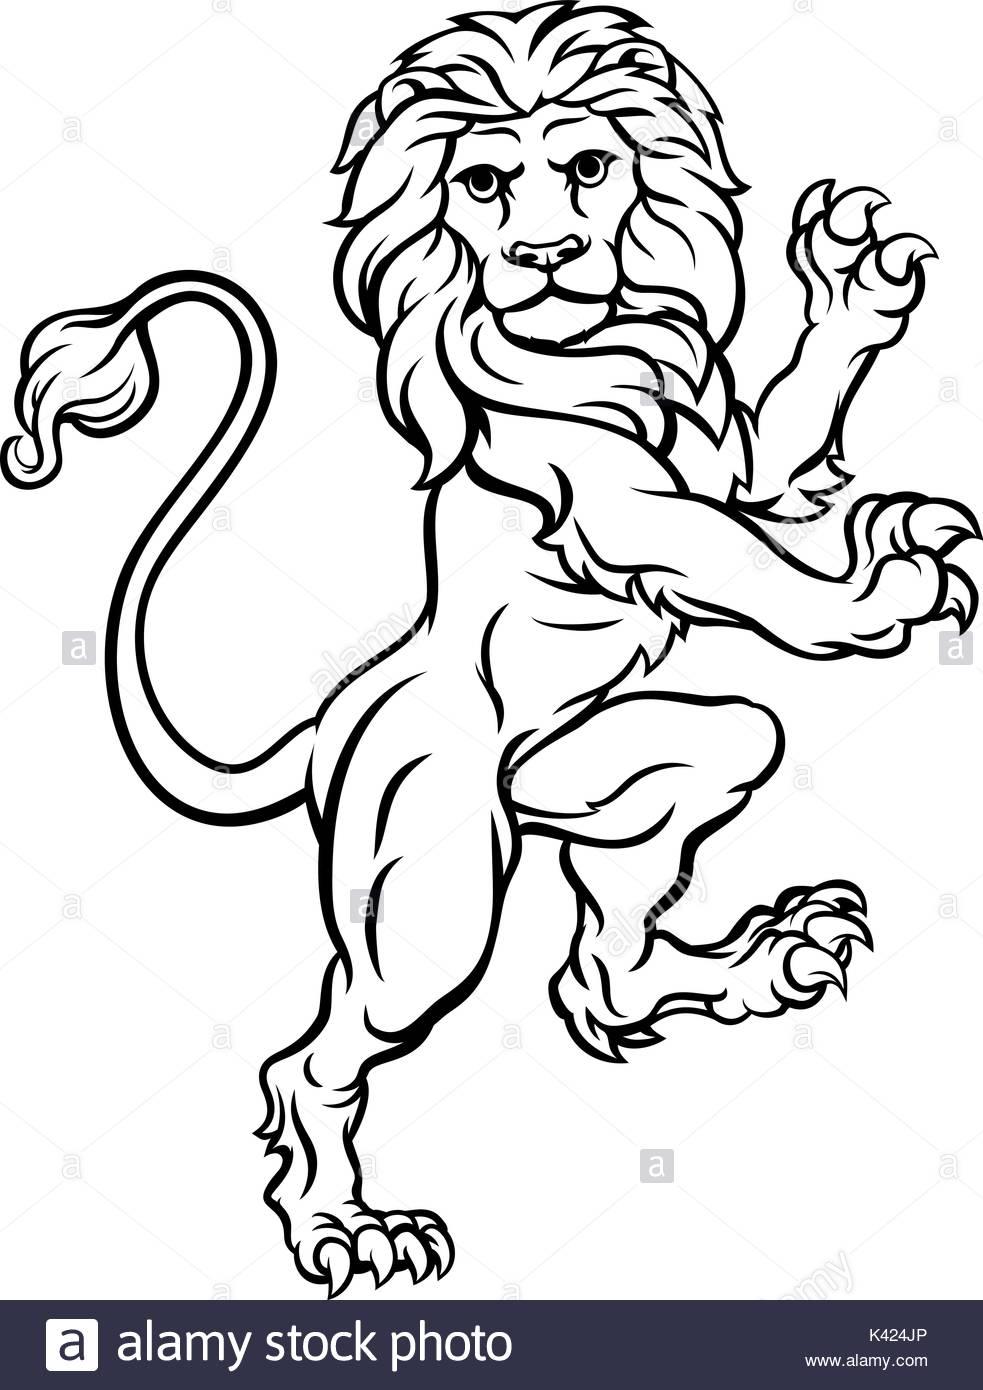 983x1390 Lion Rampant Heraldic Crest Coat Of Arms Stock Vector Art